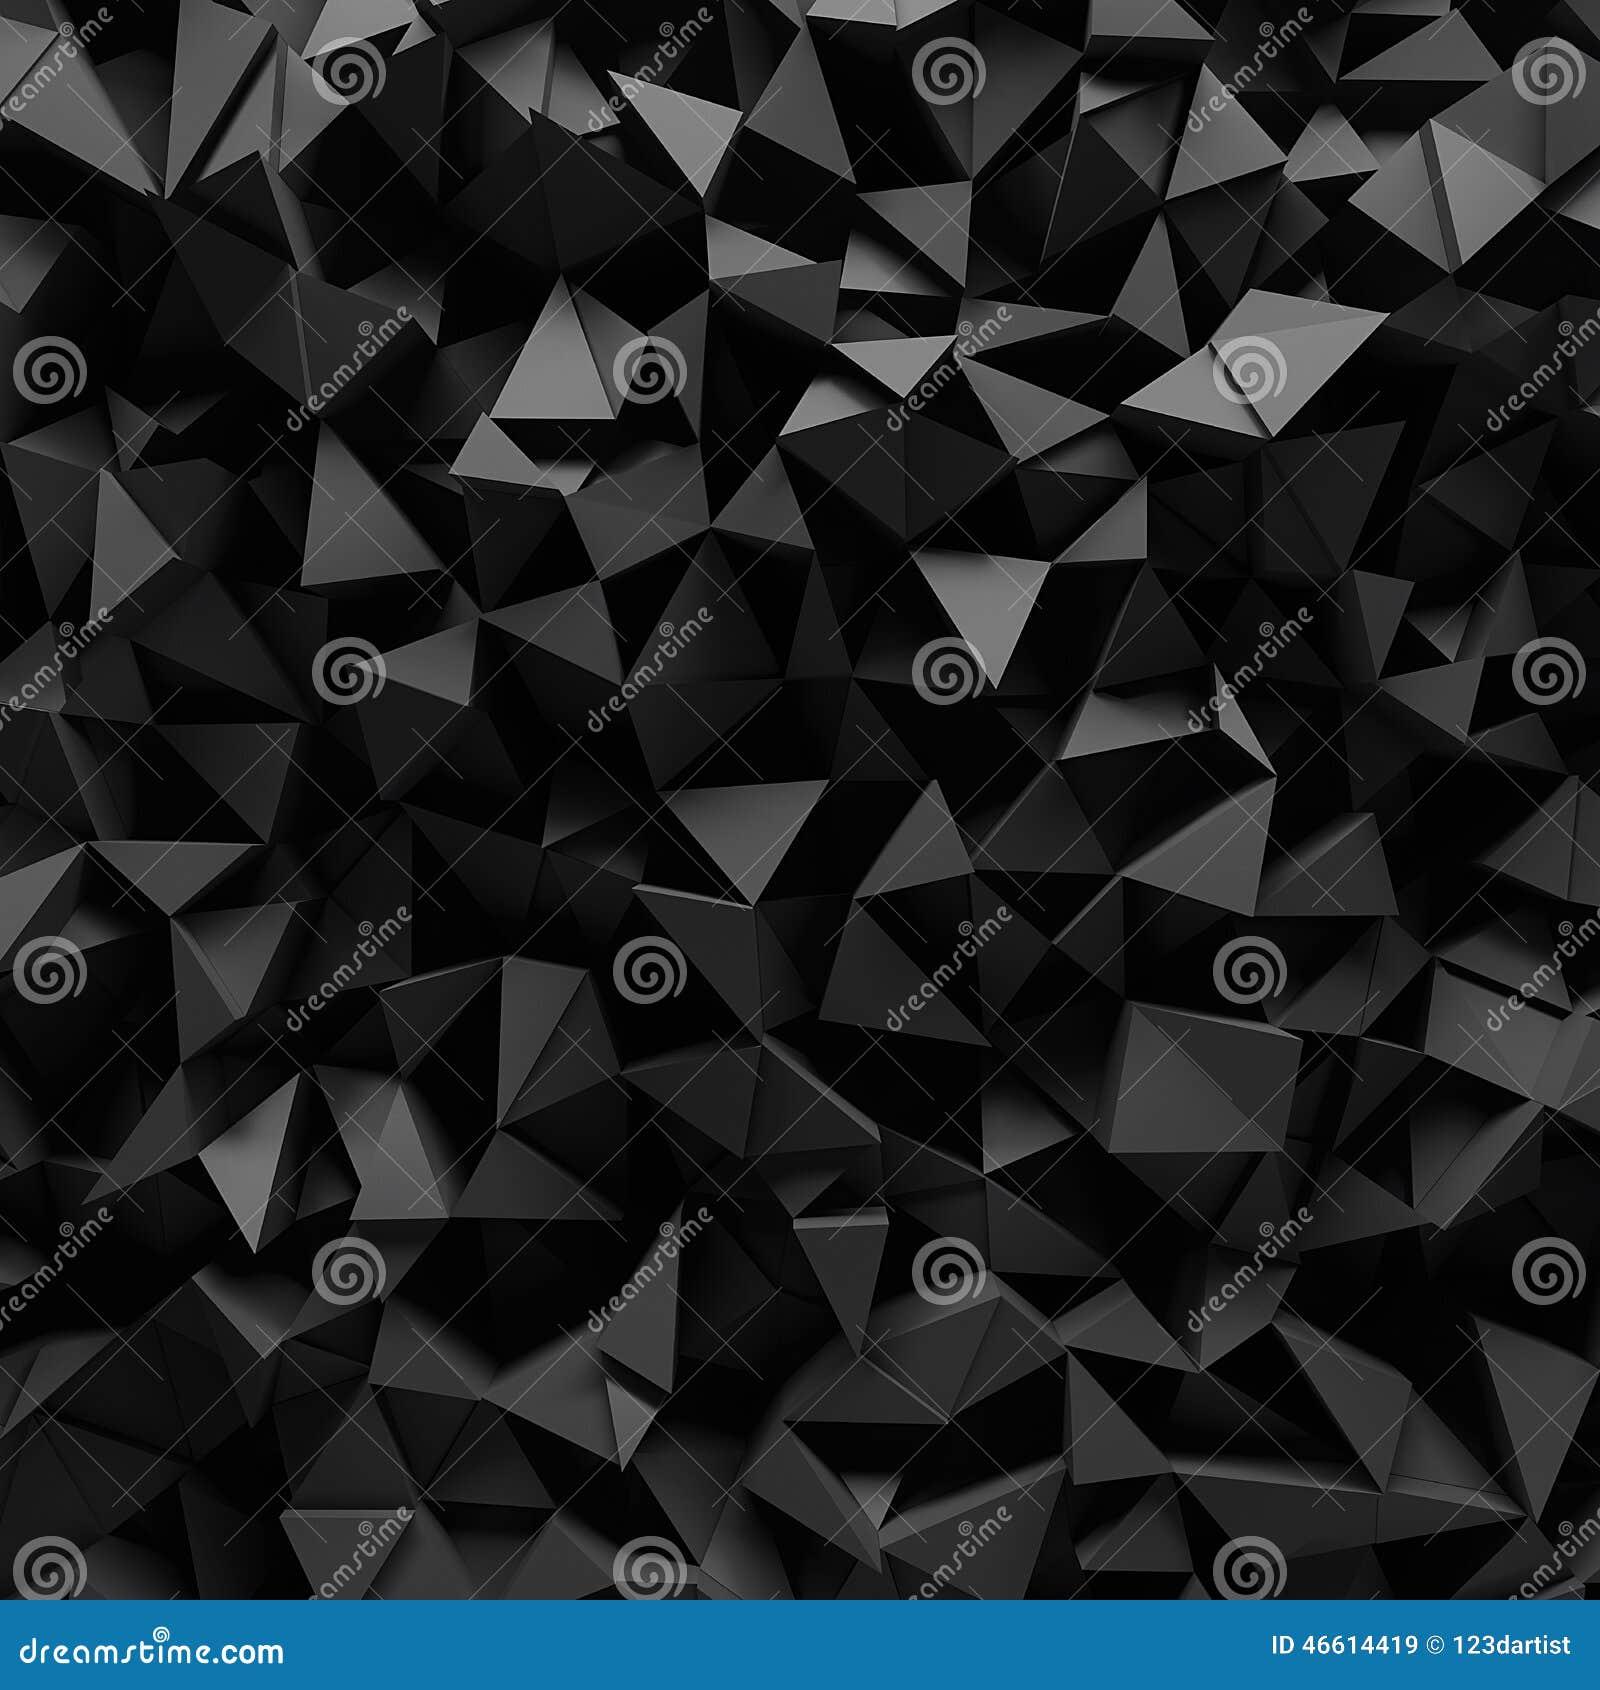 D background images - Background